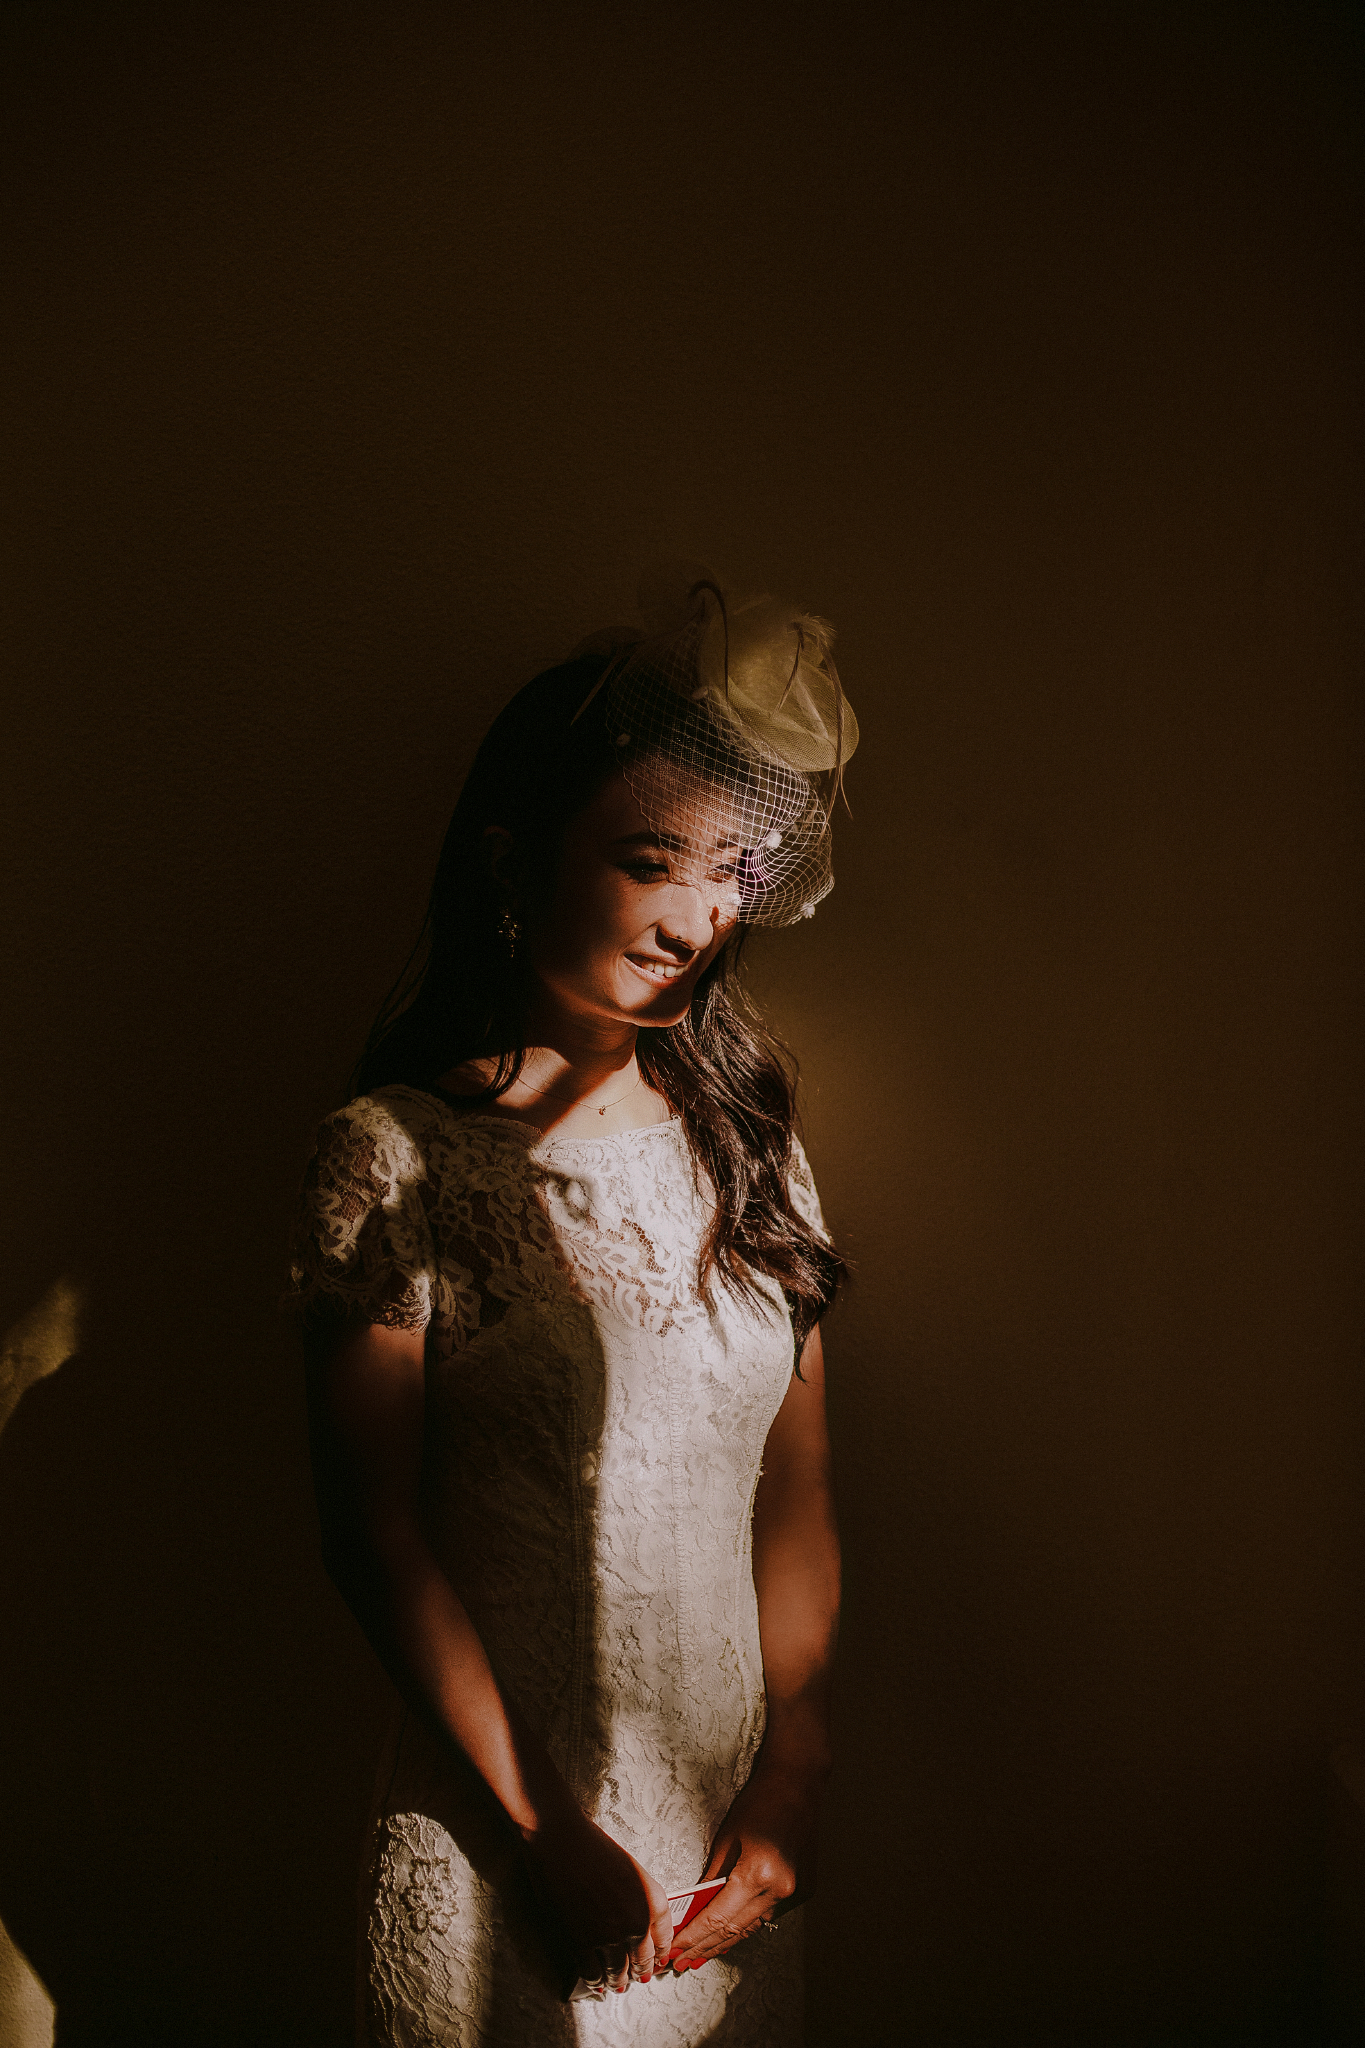 san diego wedding   photographer | woman in dress smiling under sunlight